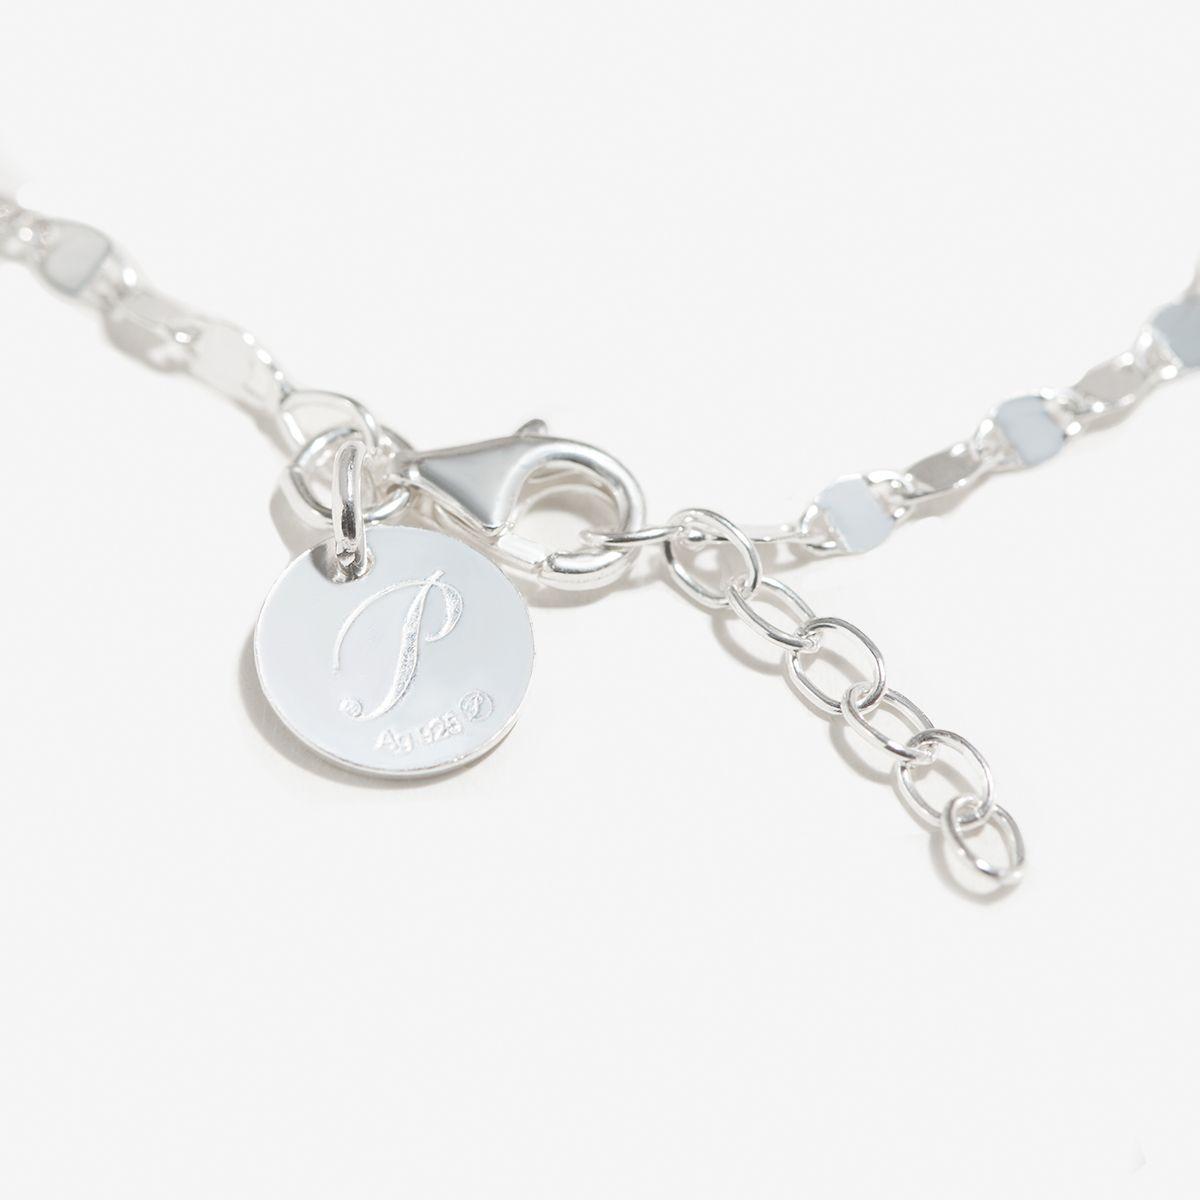 Liana - Armband - Silber